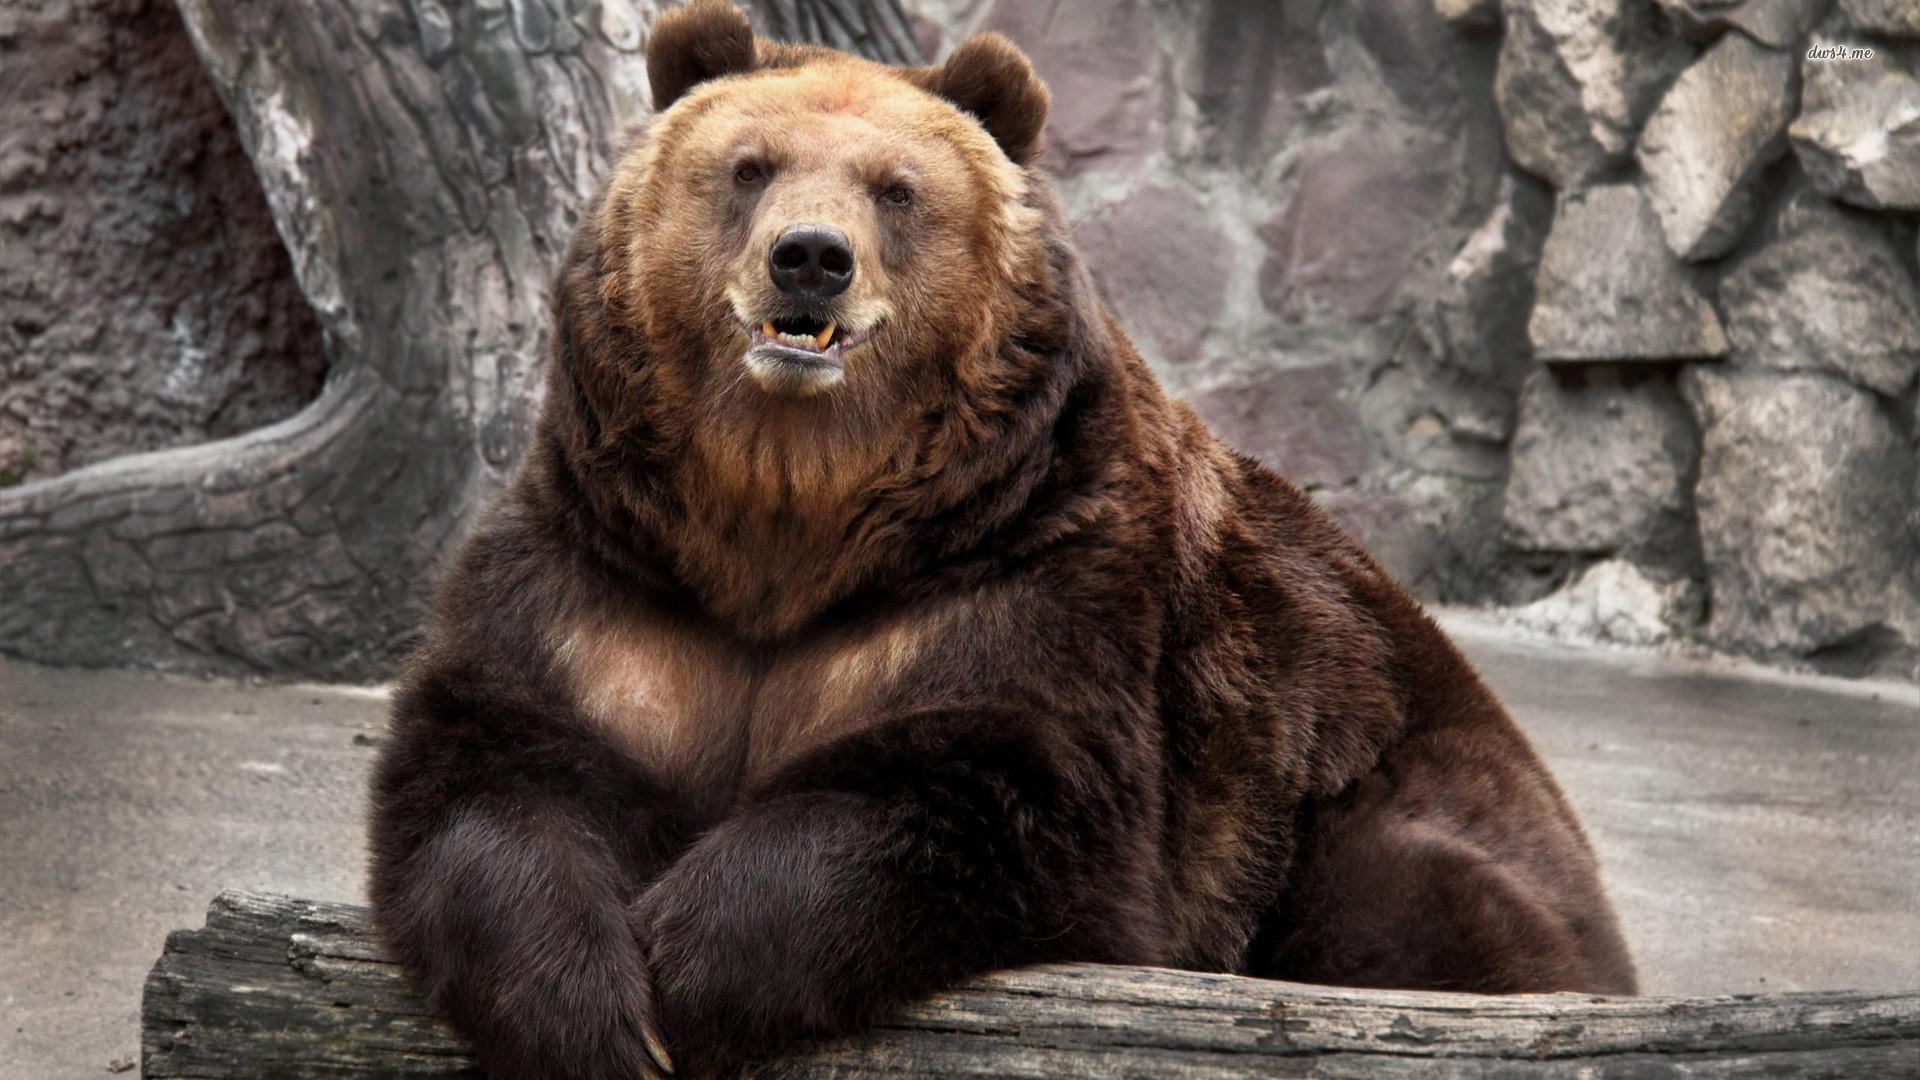 Bear HD Wallpapers Backgrounds Wallpaper